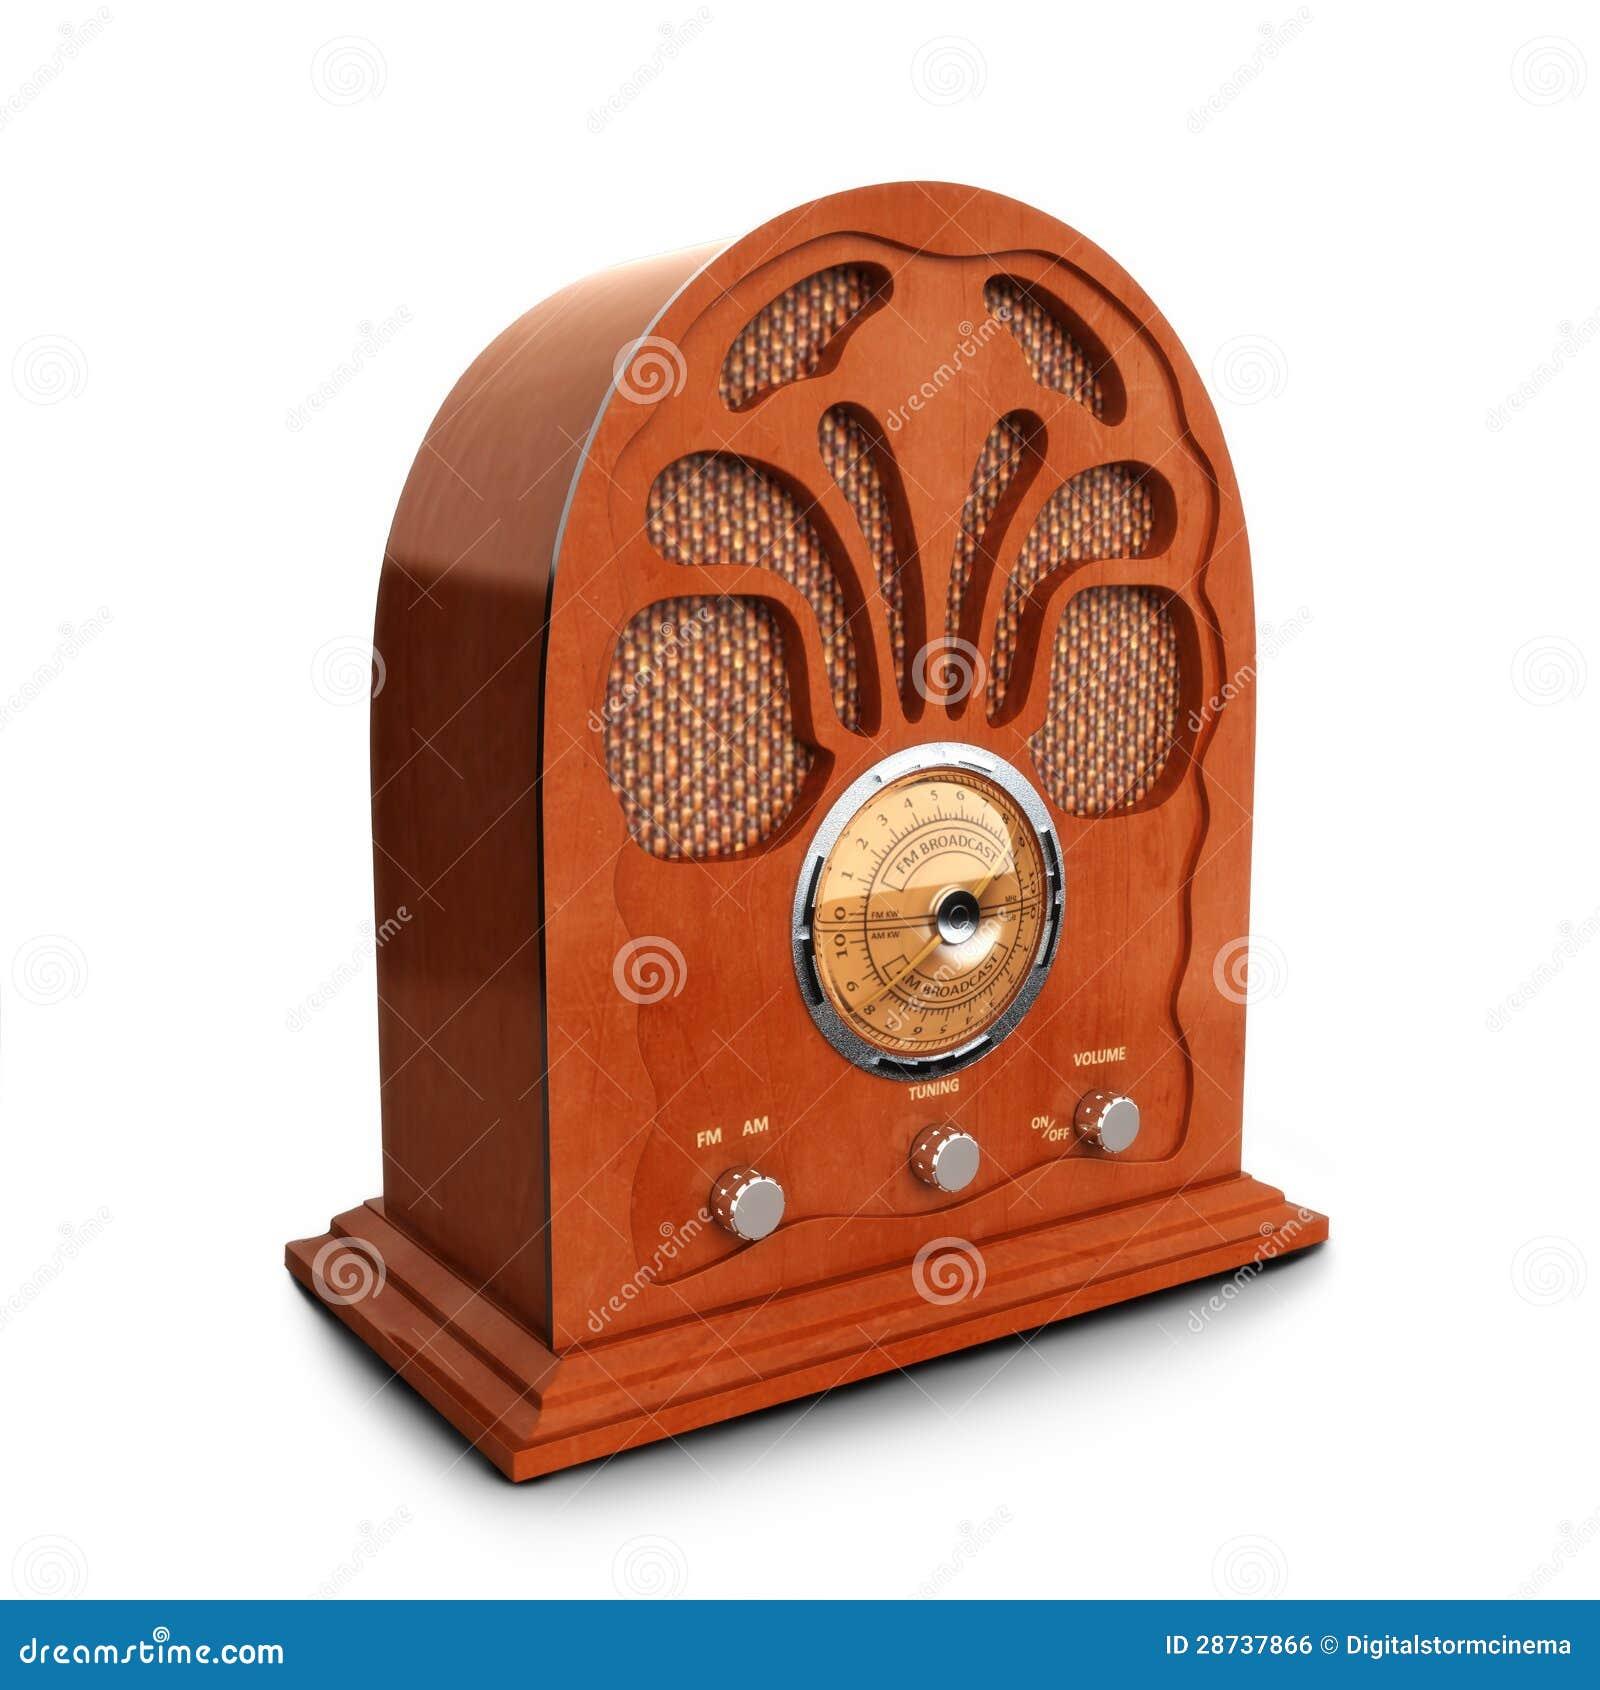 retro vintage wood radio stock illustration image of knobs 28737866. Black Bedroom Furniture Sets. Home Design Ideas